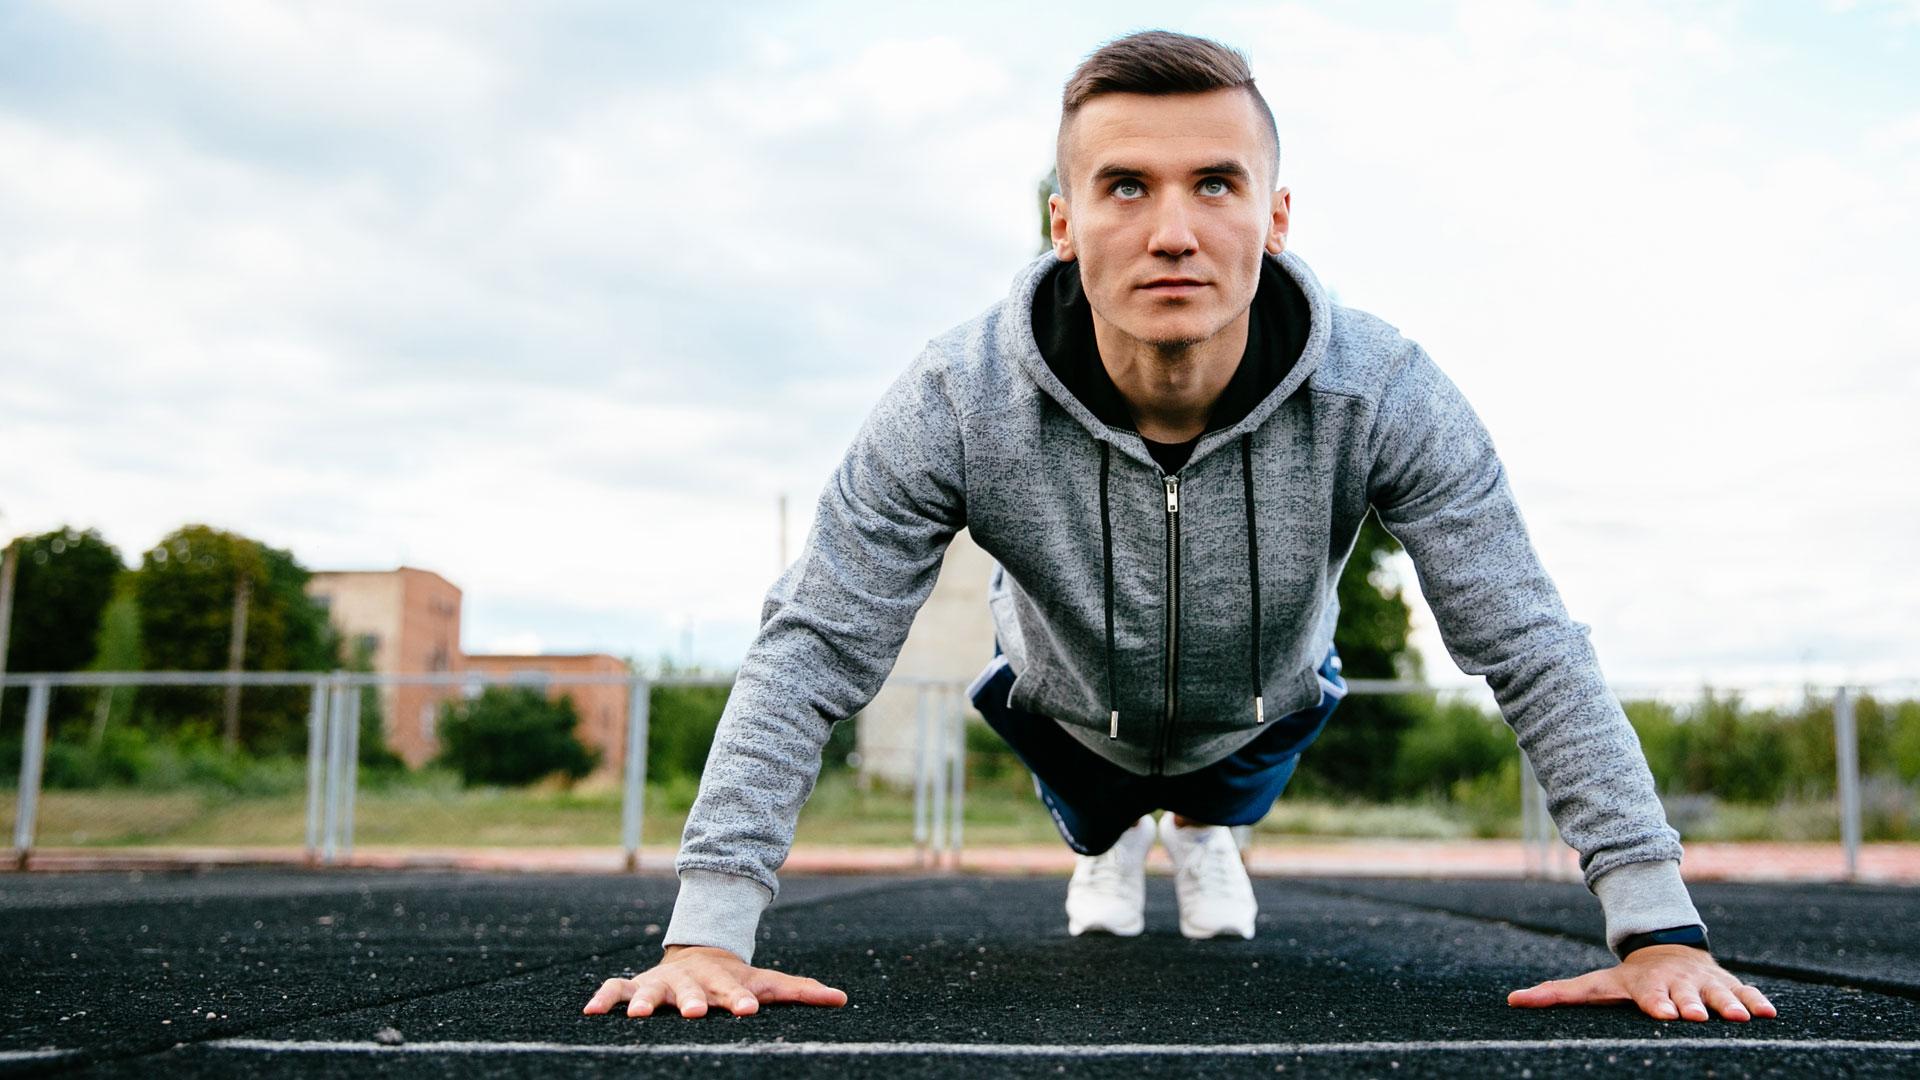 Plank esercizi core training consigli esperto Santucci Running Team